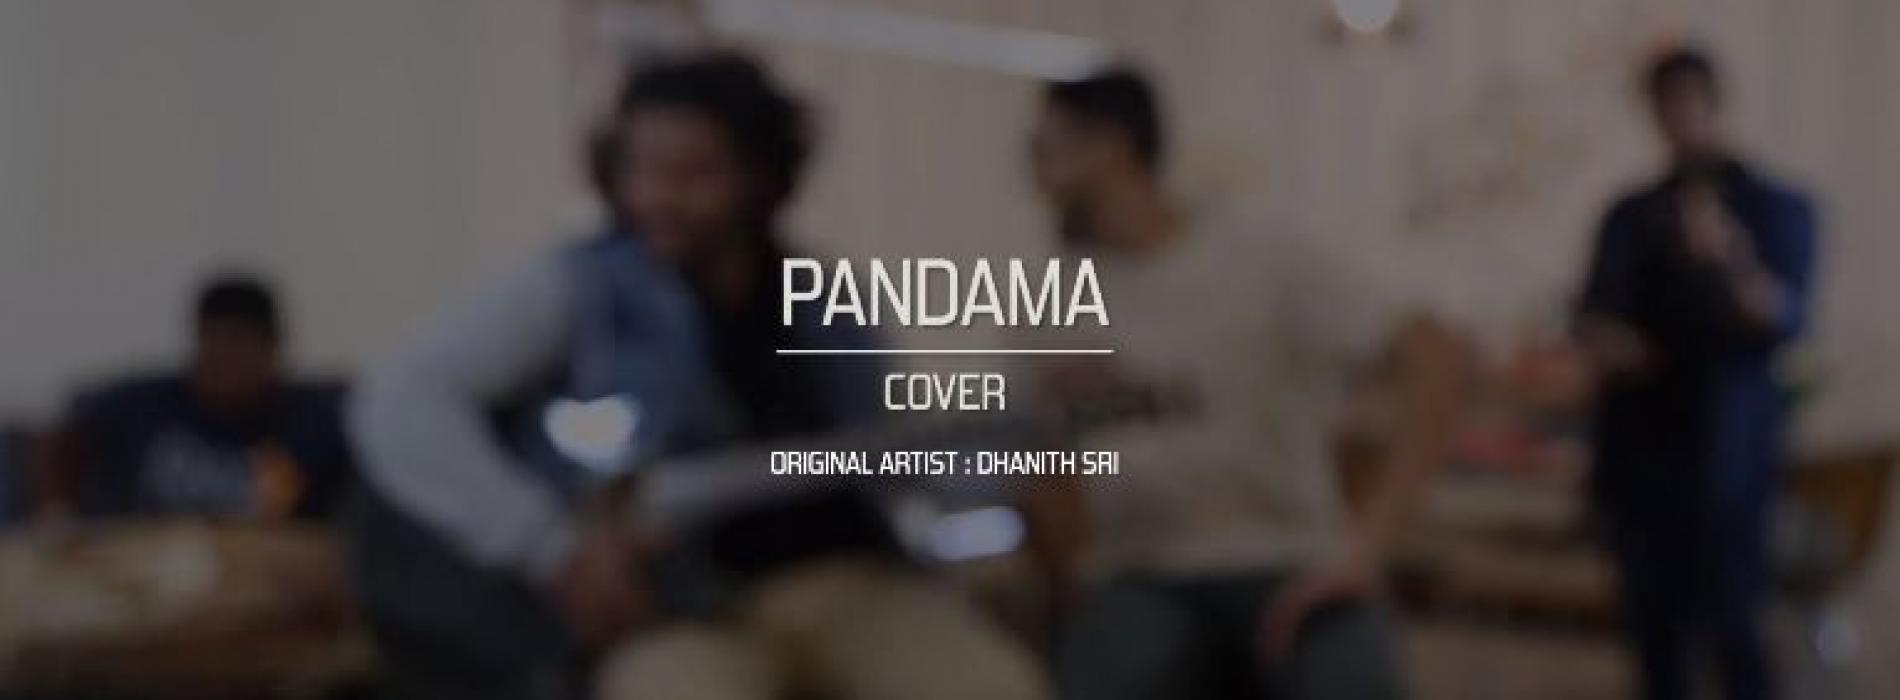 Pandama (පන්දම) Cover | Api Collaboration